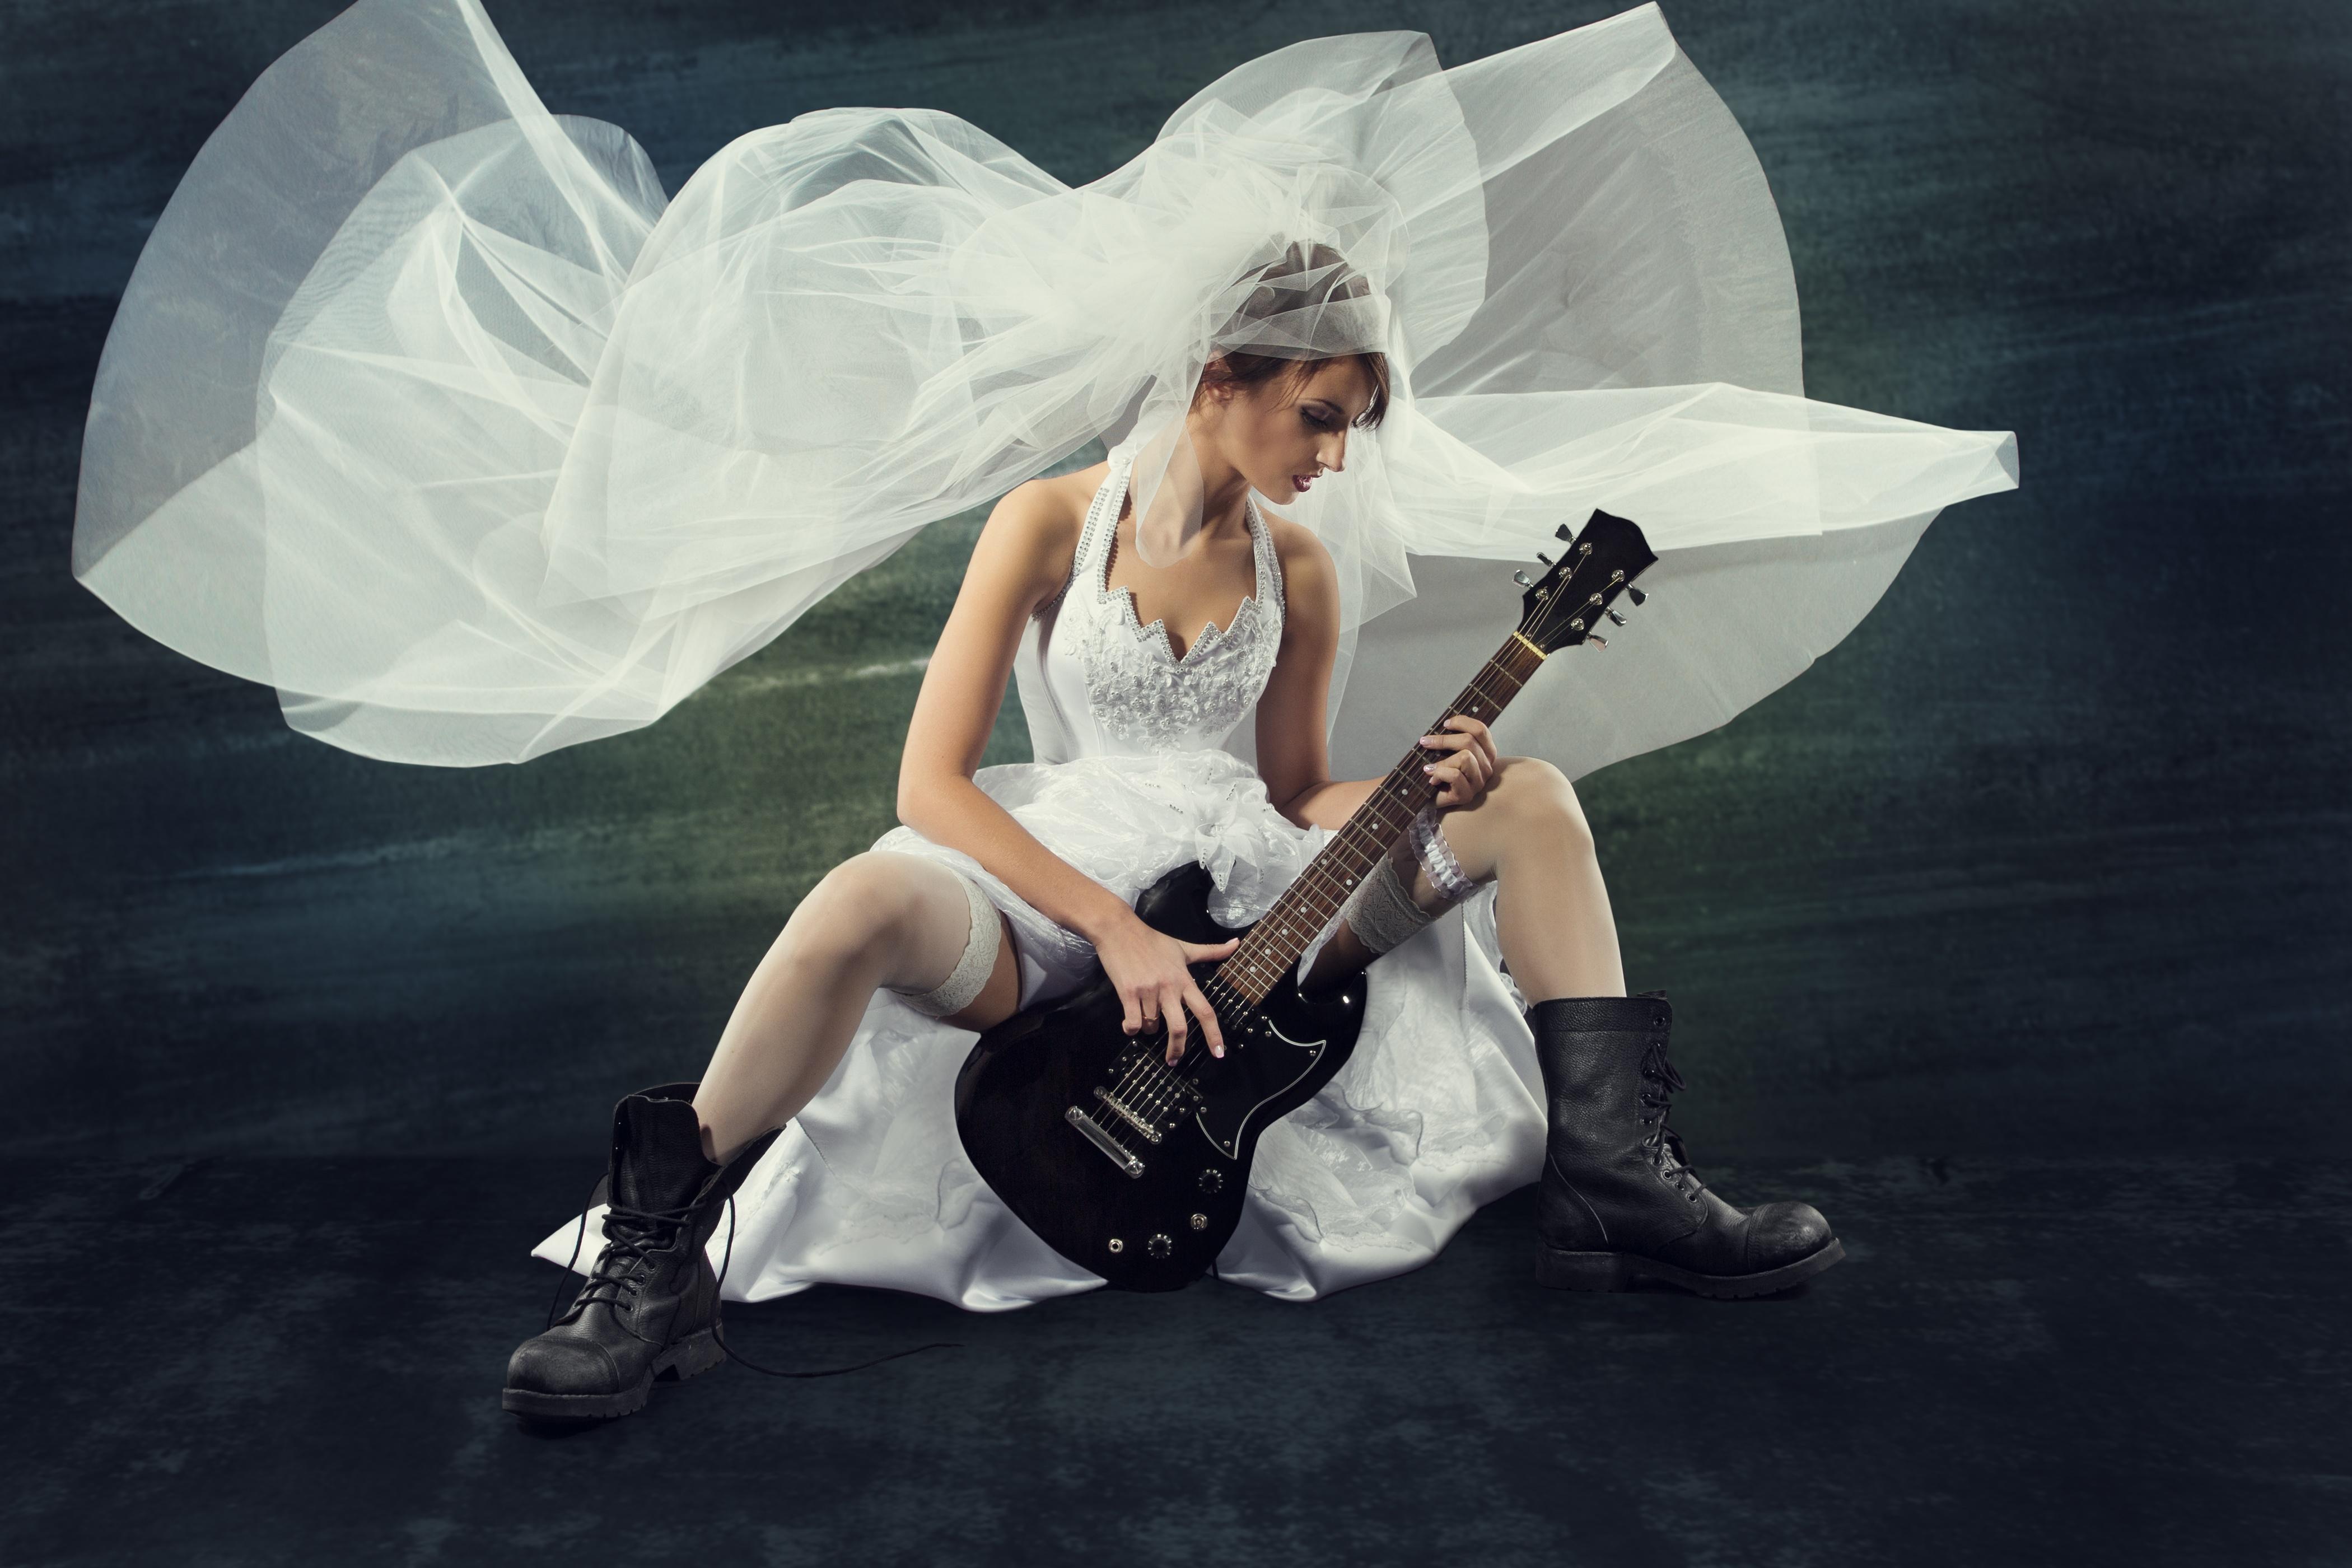 Dance Monkey - Metal Cover